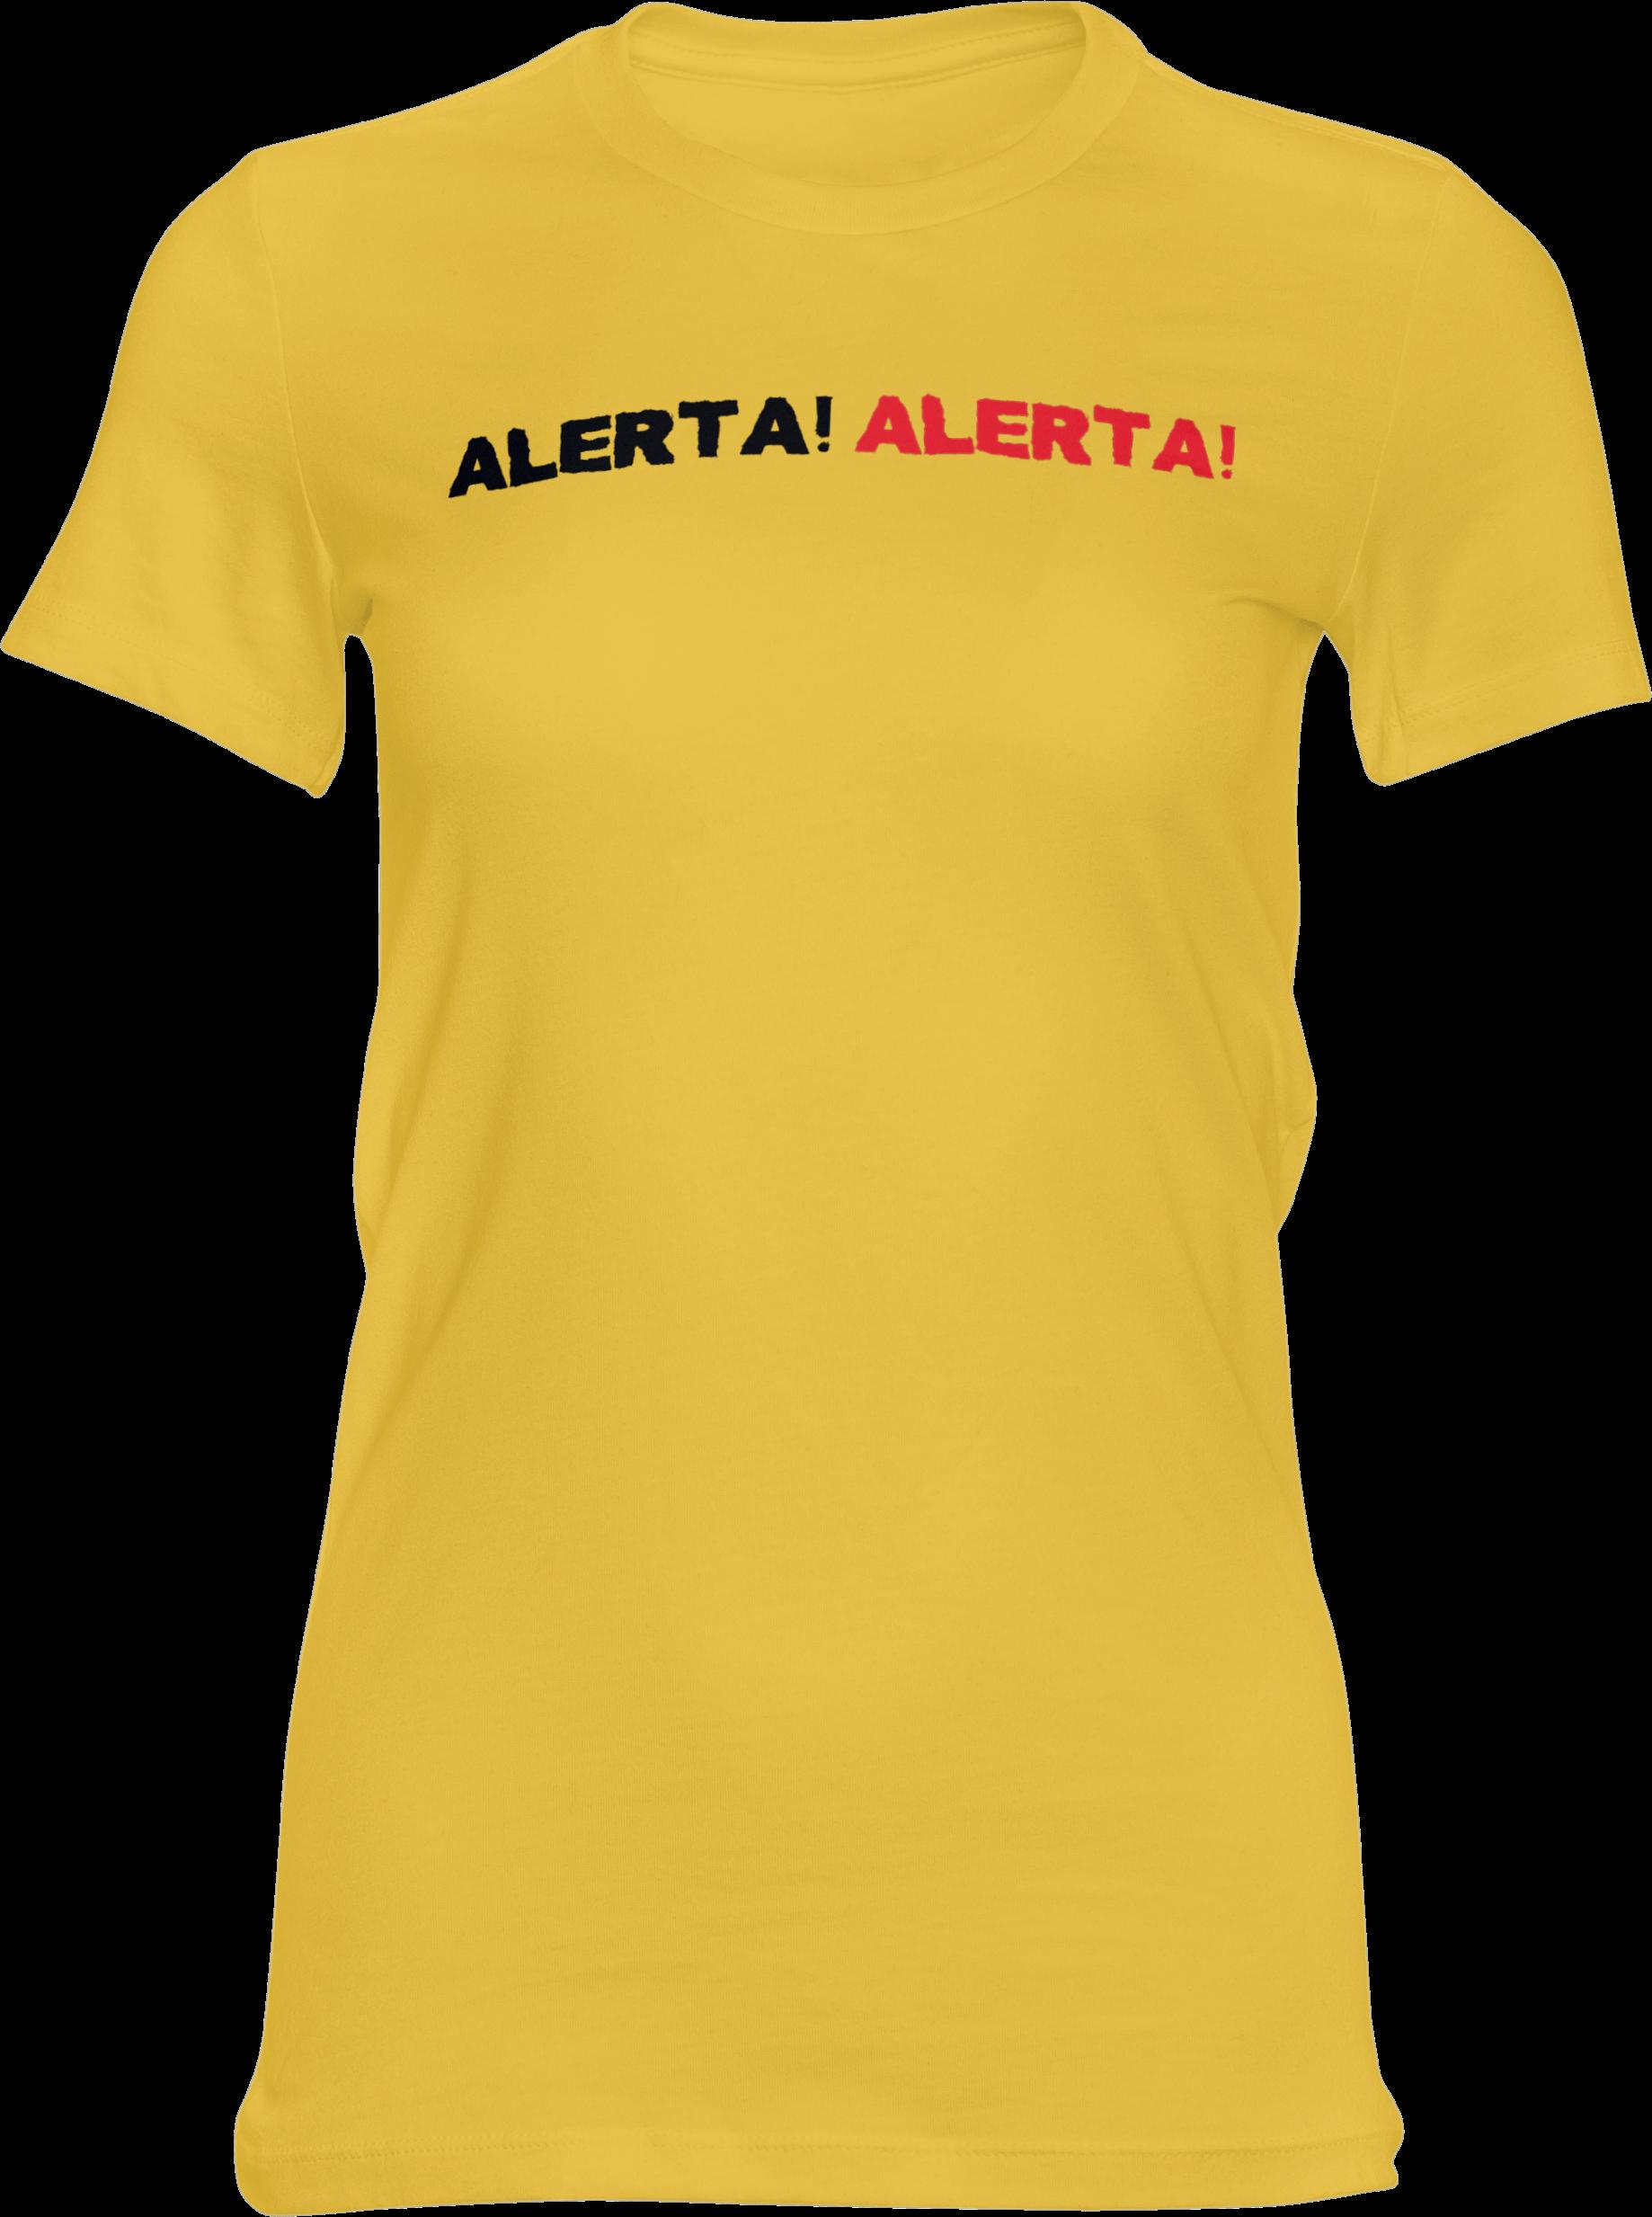 Motiv-Shirt – Alerta Alerta – Girlie-Shirt (gelb)